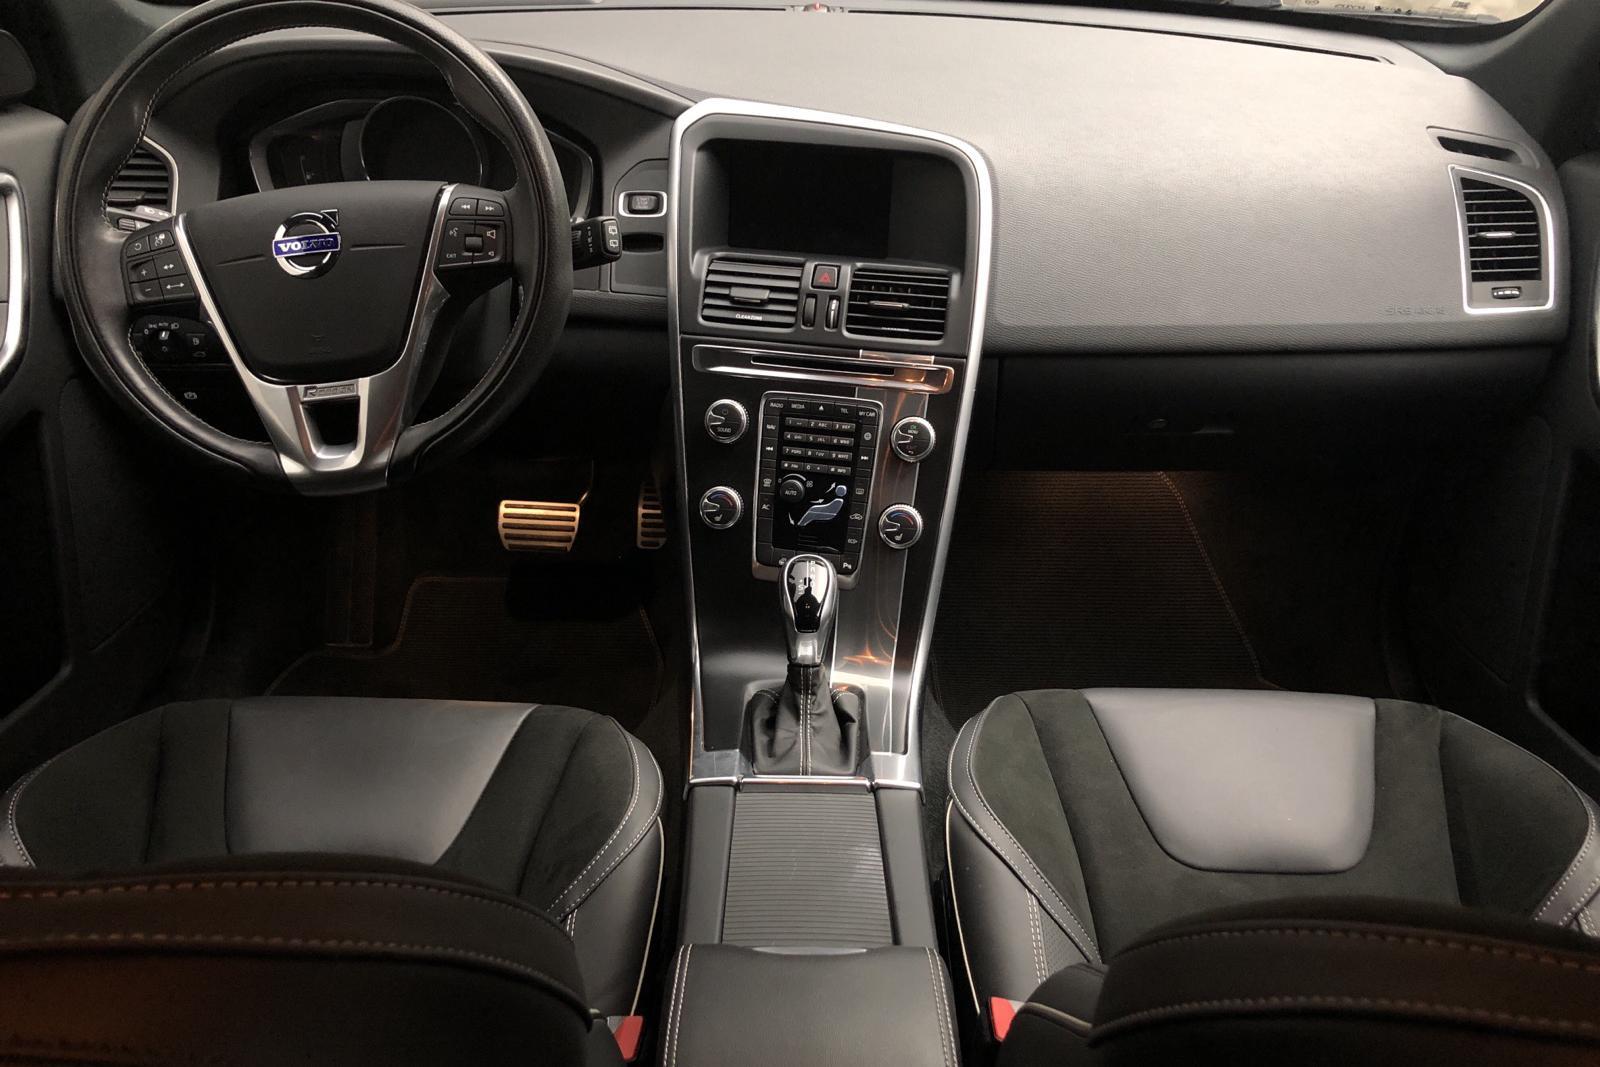 Volvo XC60 D4 2WD (190hk) - 72 314 km - Automatic - gray - 2017